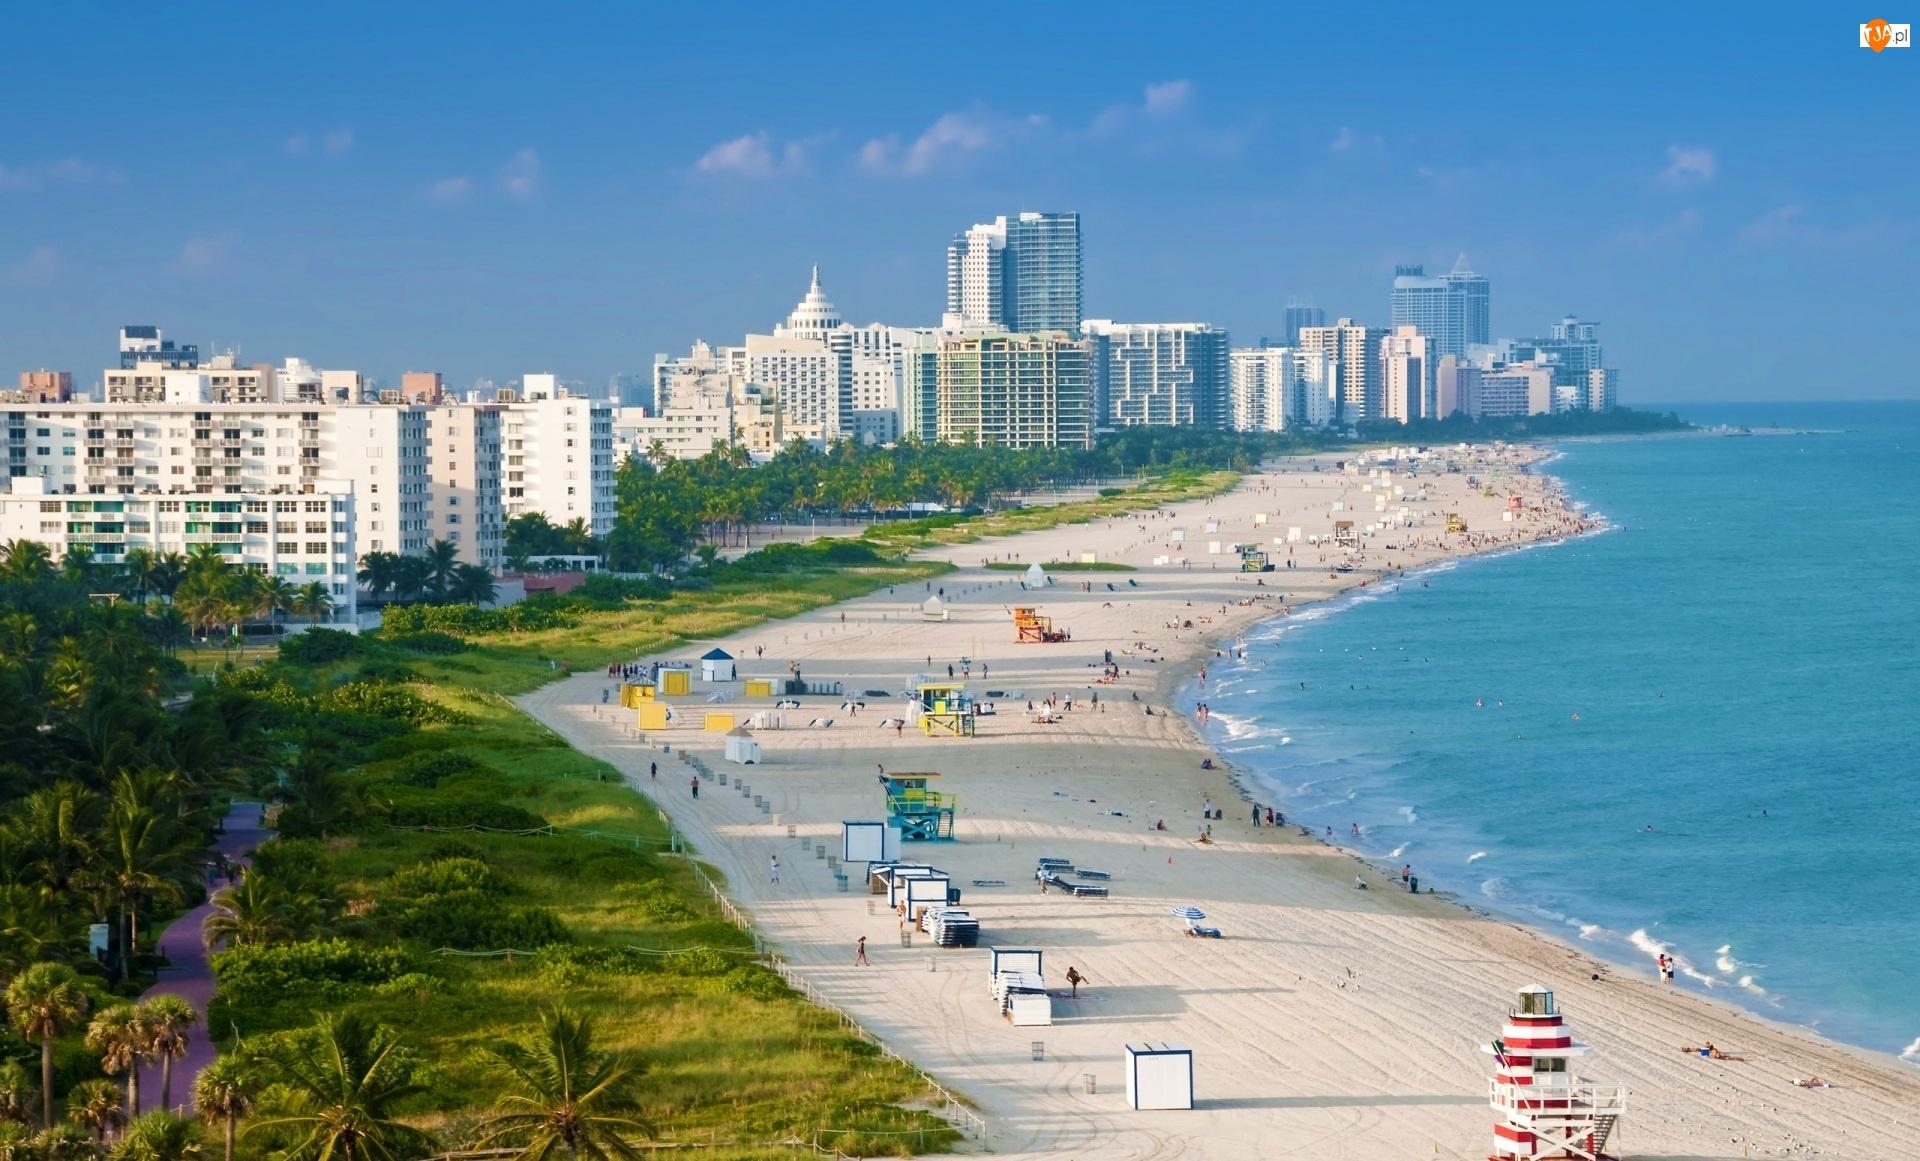 Panorama, Floryda, Miasta, Miami